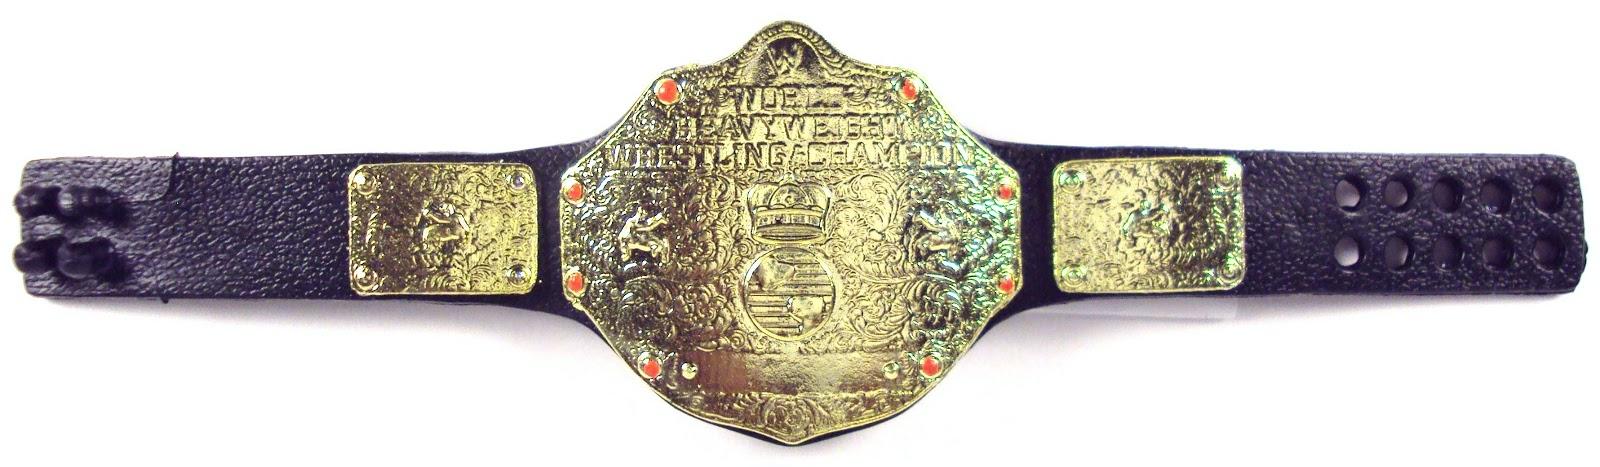 3b s toy hive wwe title belts